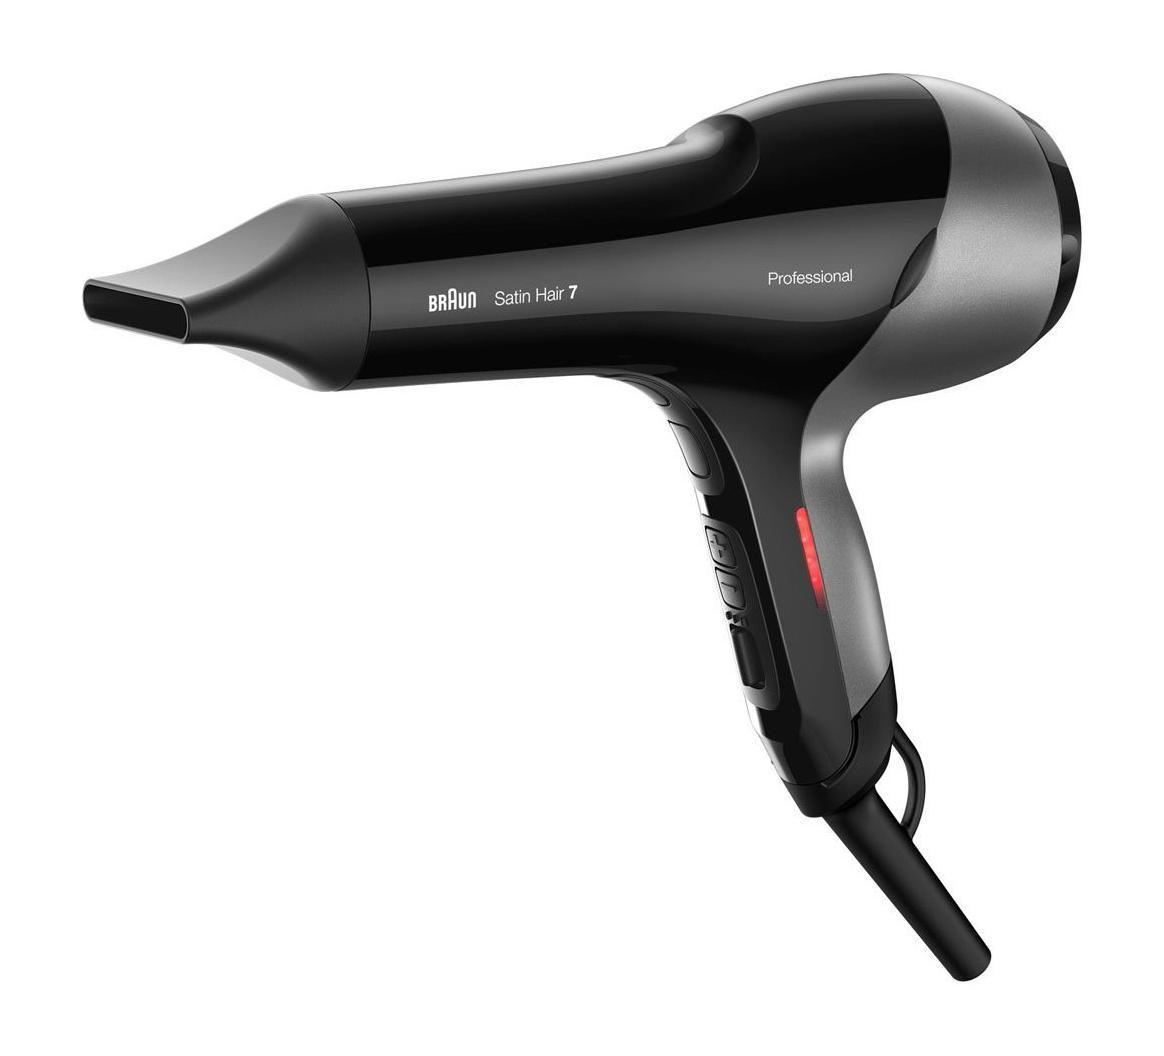 Braun Satin Hair 7 SensoDryer HD 780 фен расческа satin hair 7 iontec br730